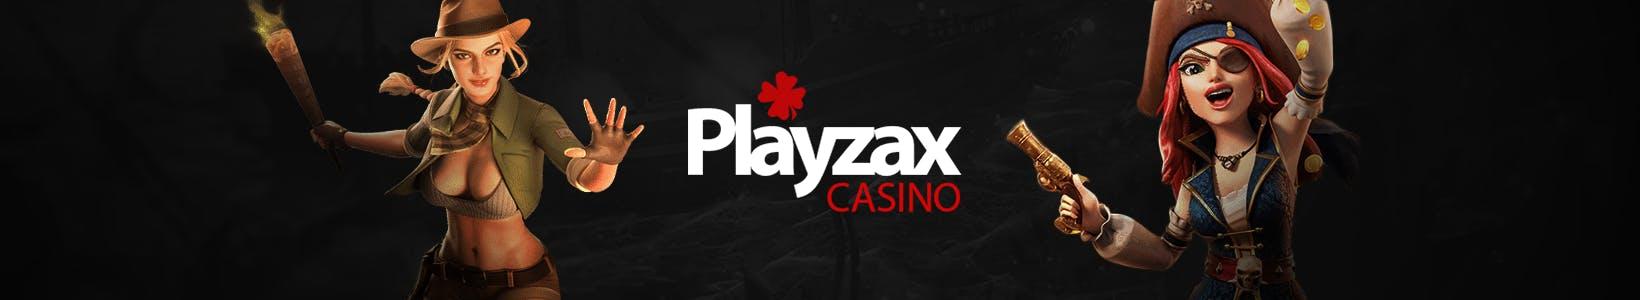 banniere de promotion originale kagino io playzax casino